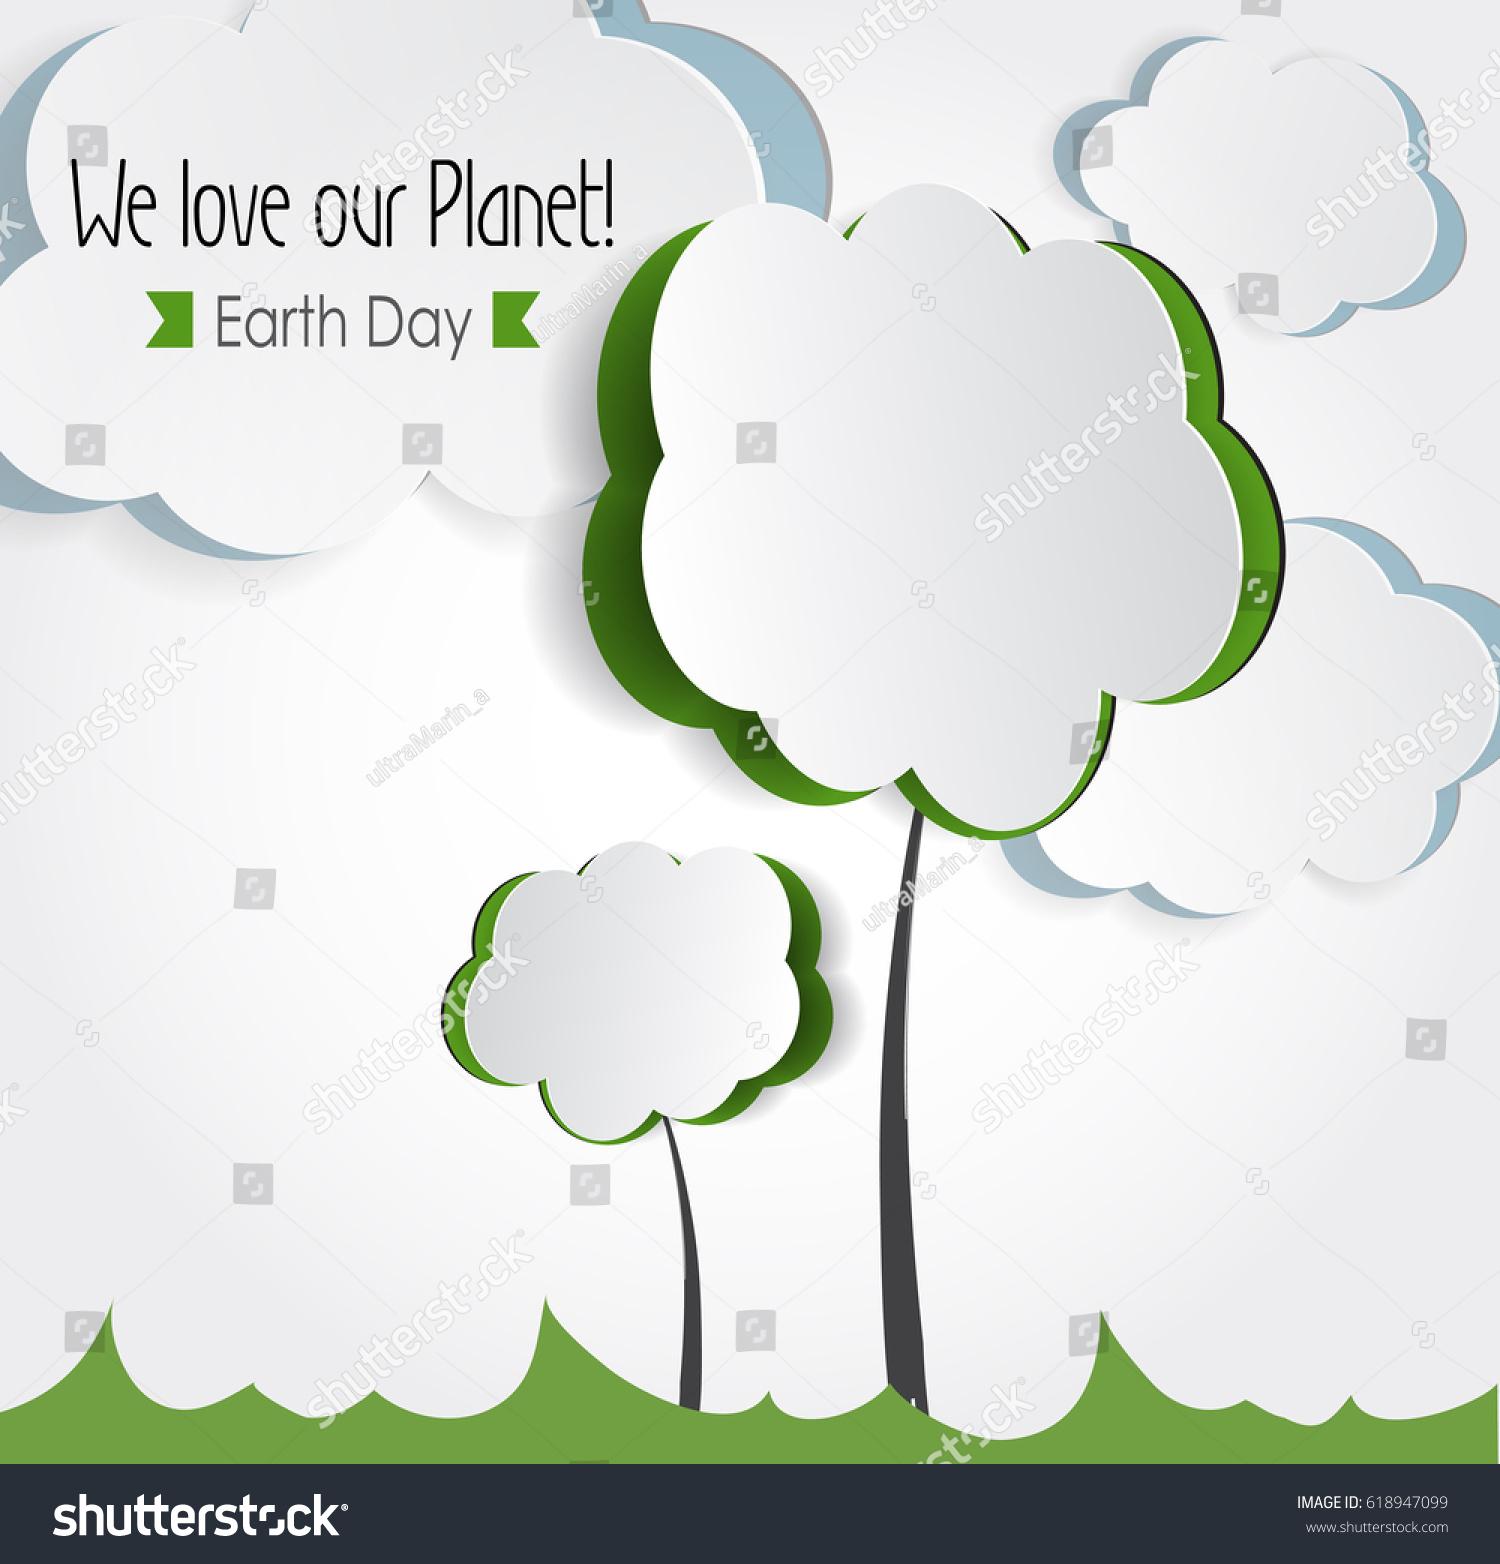 Environmental Concept Earthfriendly Landscapes: Vector Earth Day Eco Friendly Ecology Stock Vector